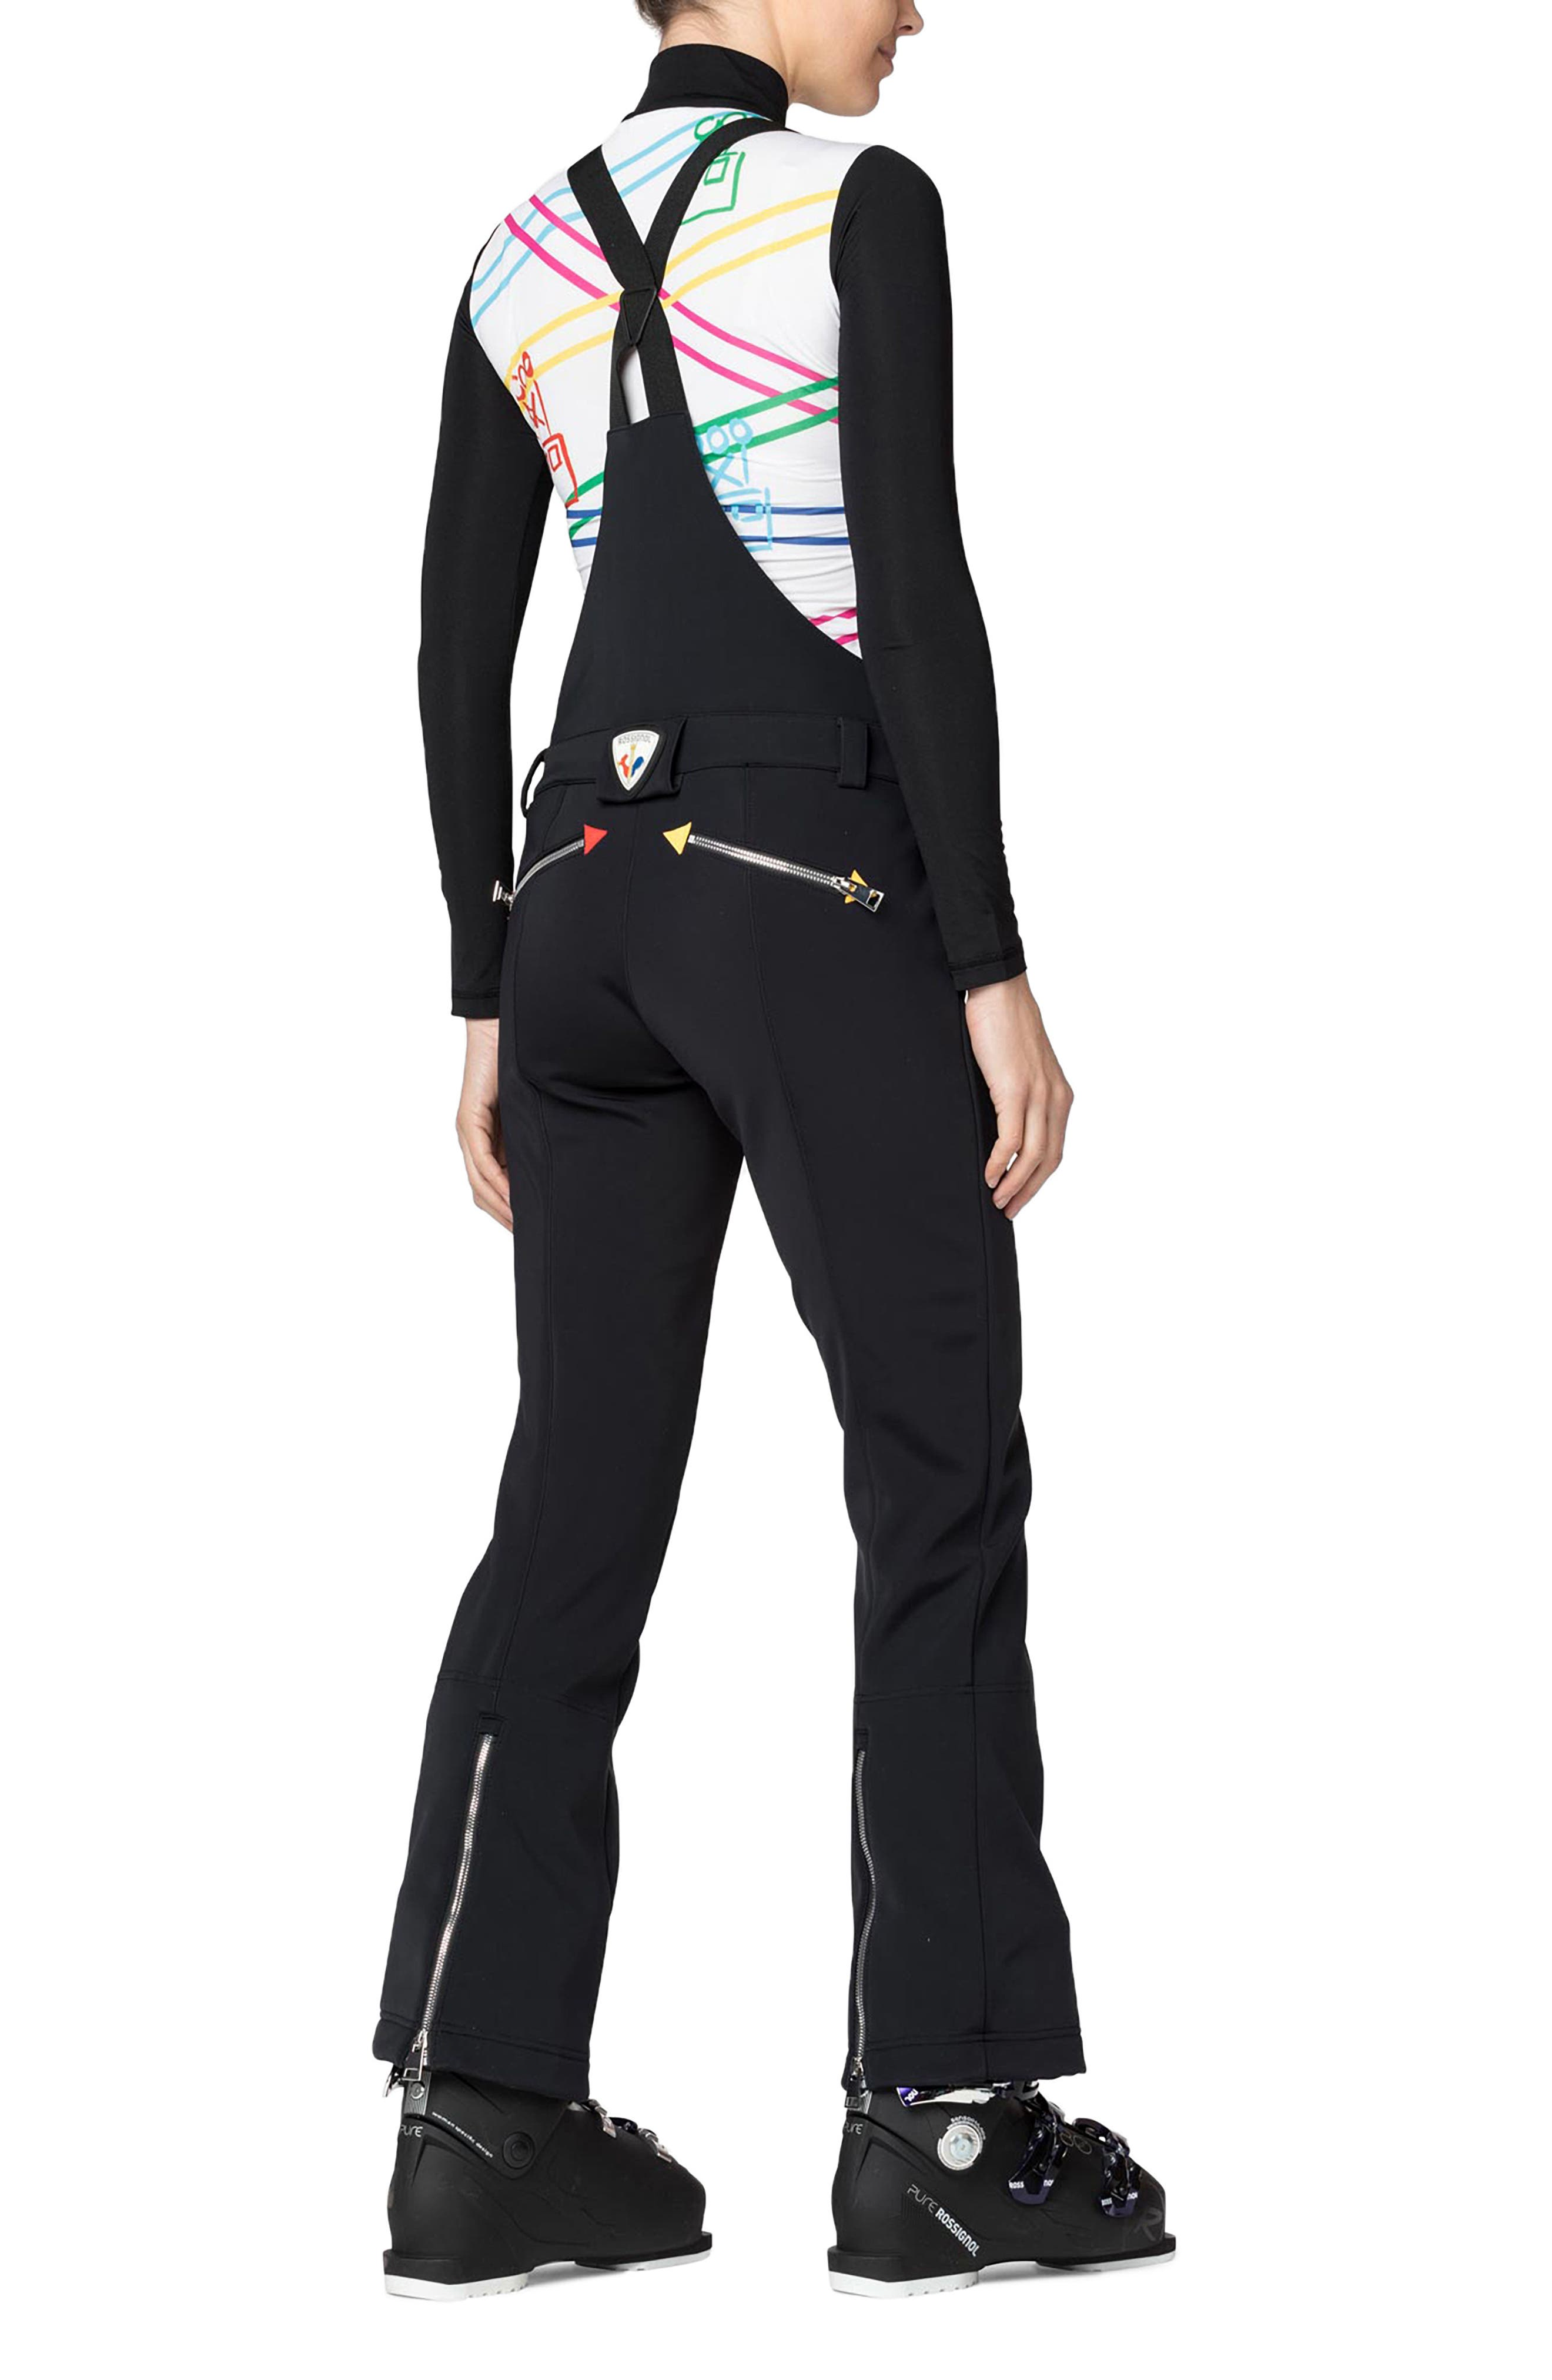 Altirock One-Piece Ski Suit,                             Alternate thumbnail 2, color,                             010